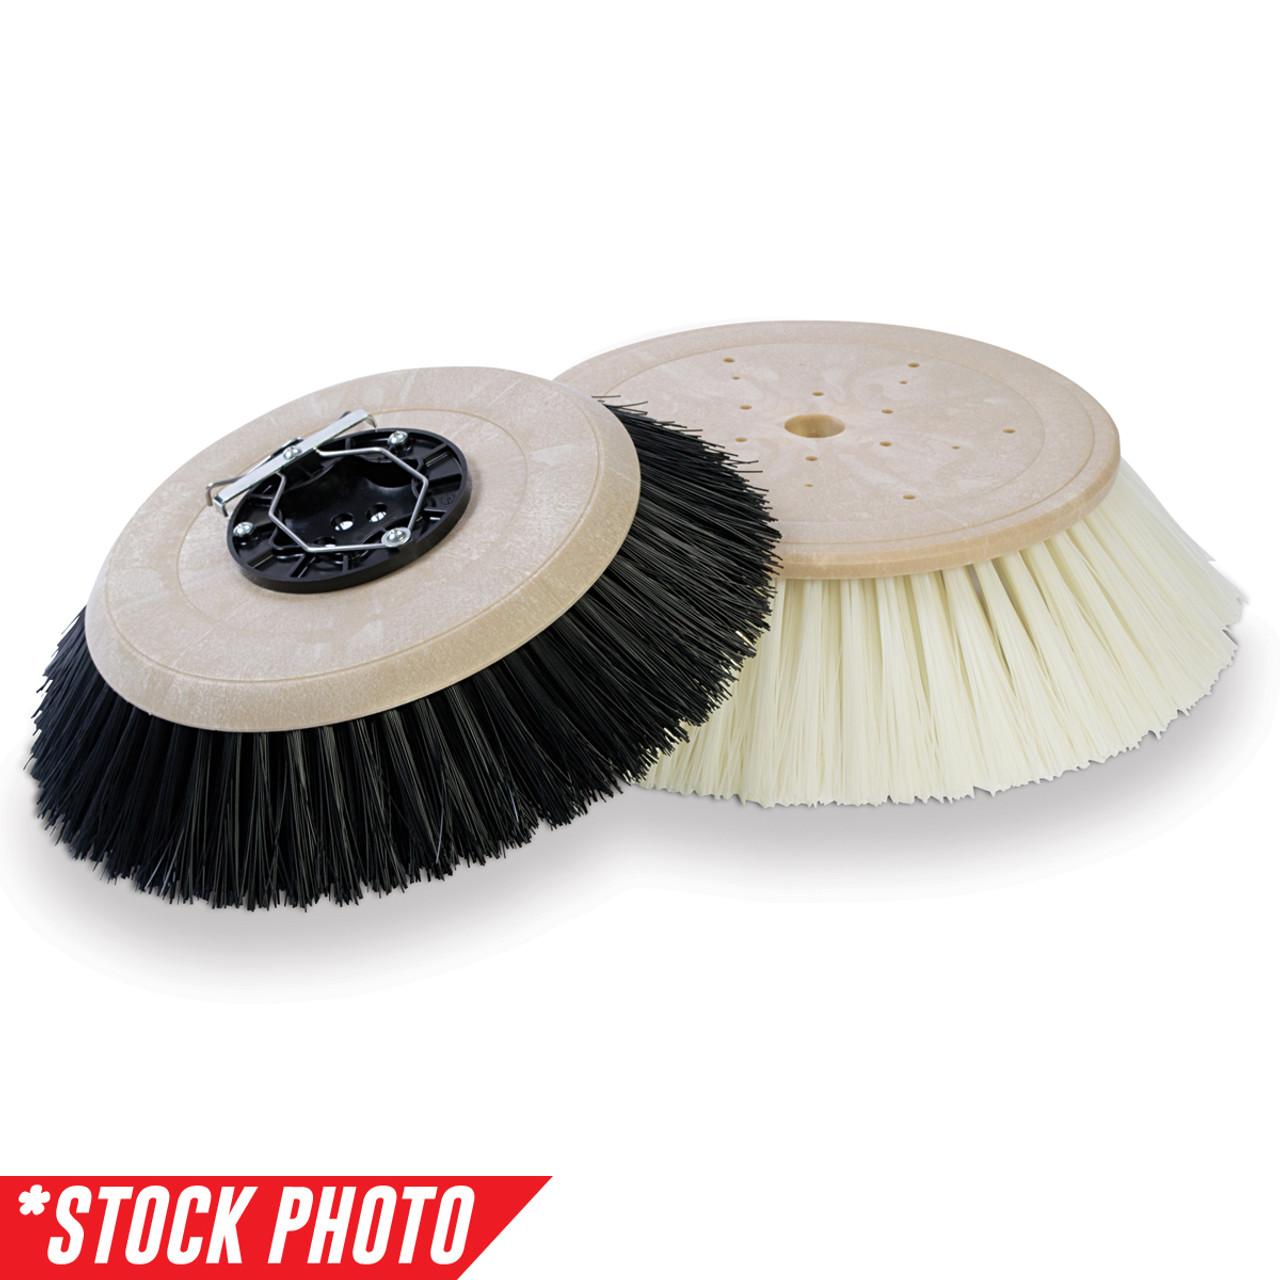 "59431: 14"" Side Broom 3 Single Row Poly  fits Tennant Models 355, 355E, 385, 6400, 8200, 8210, 8400, 8410, S20"